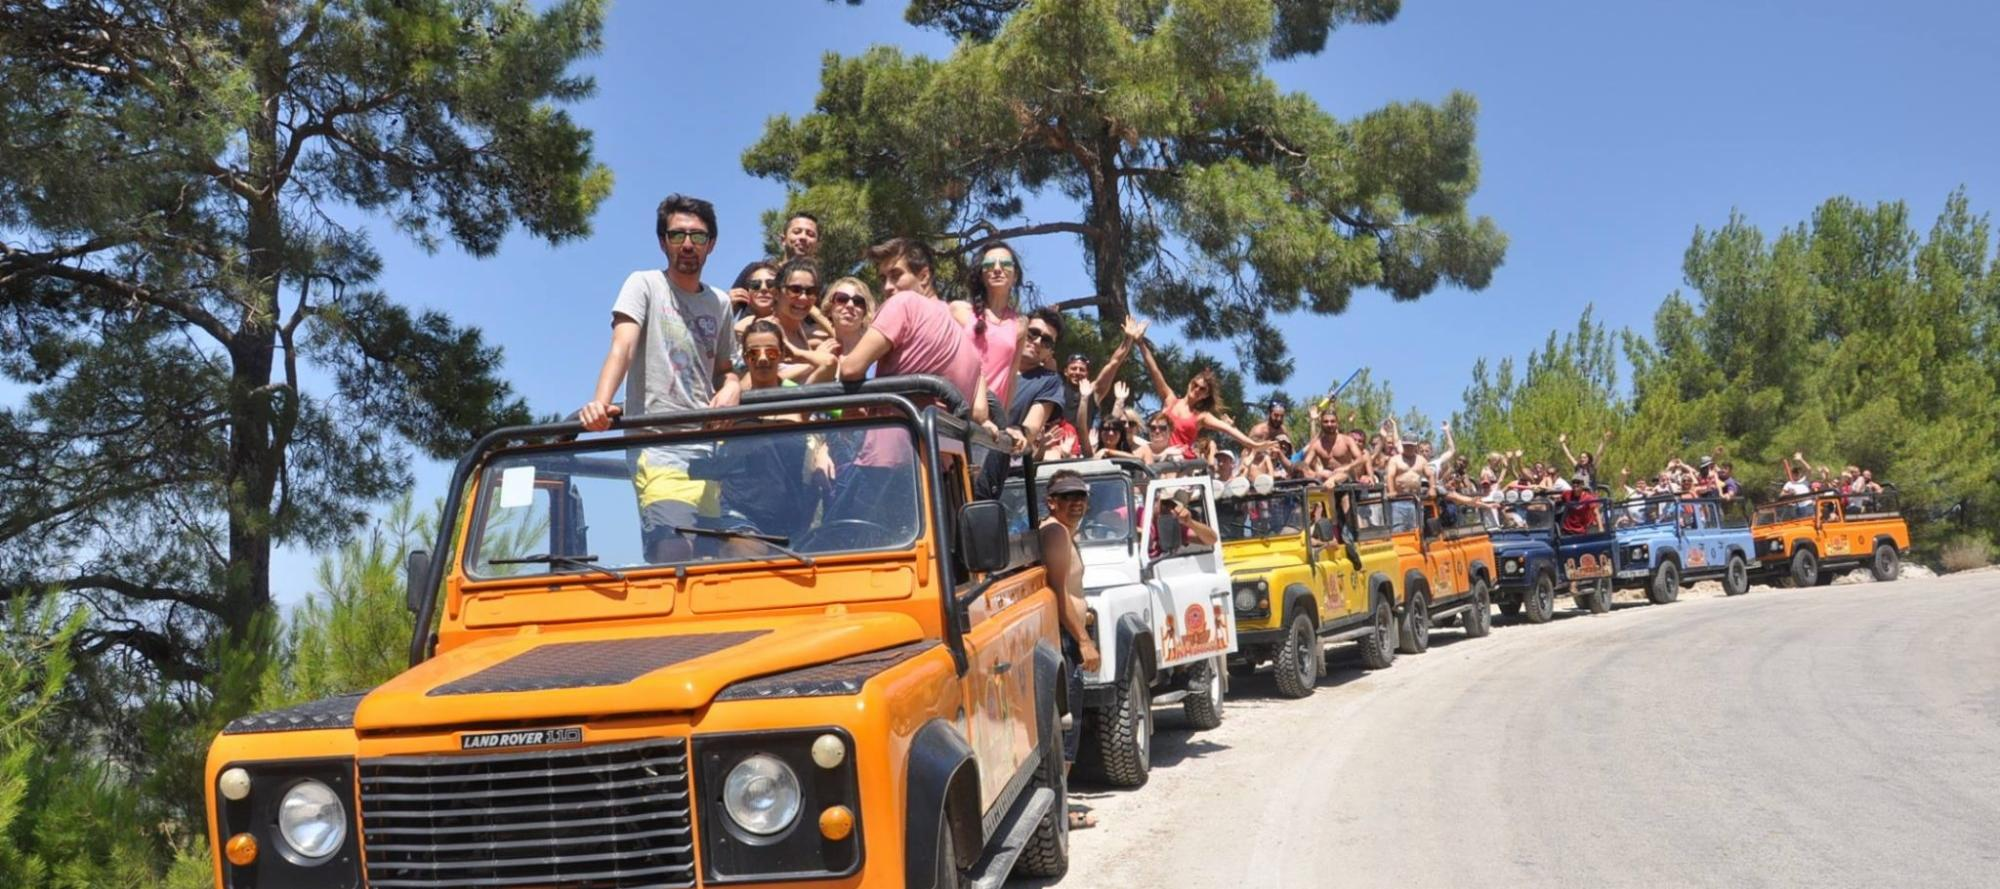 Jeep safari tour in Kusadasi, Turkey | Best day trips in Kusadasi